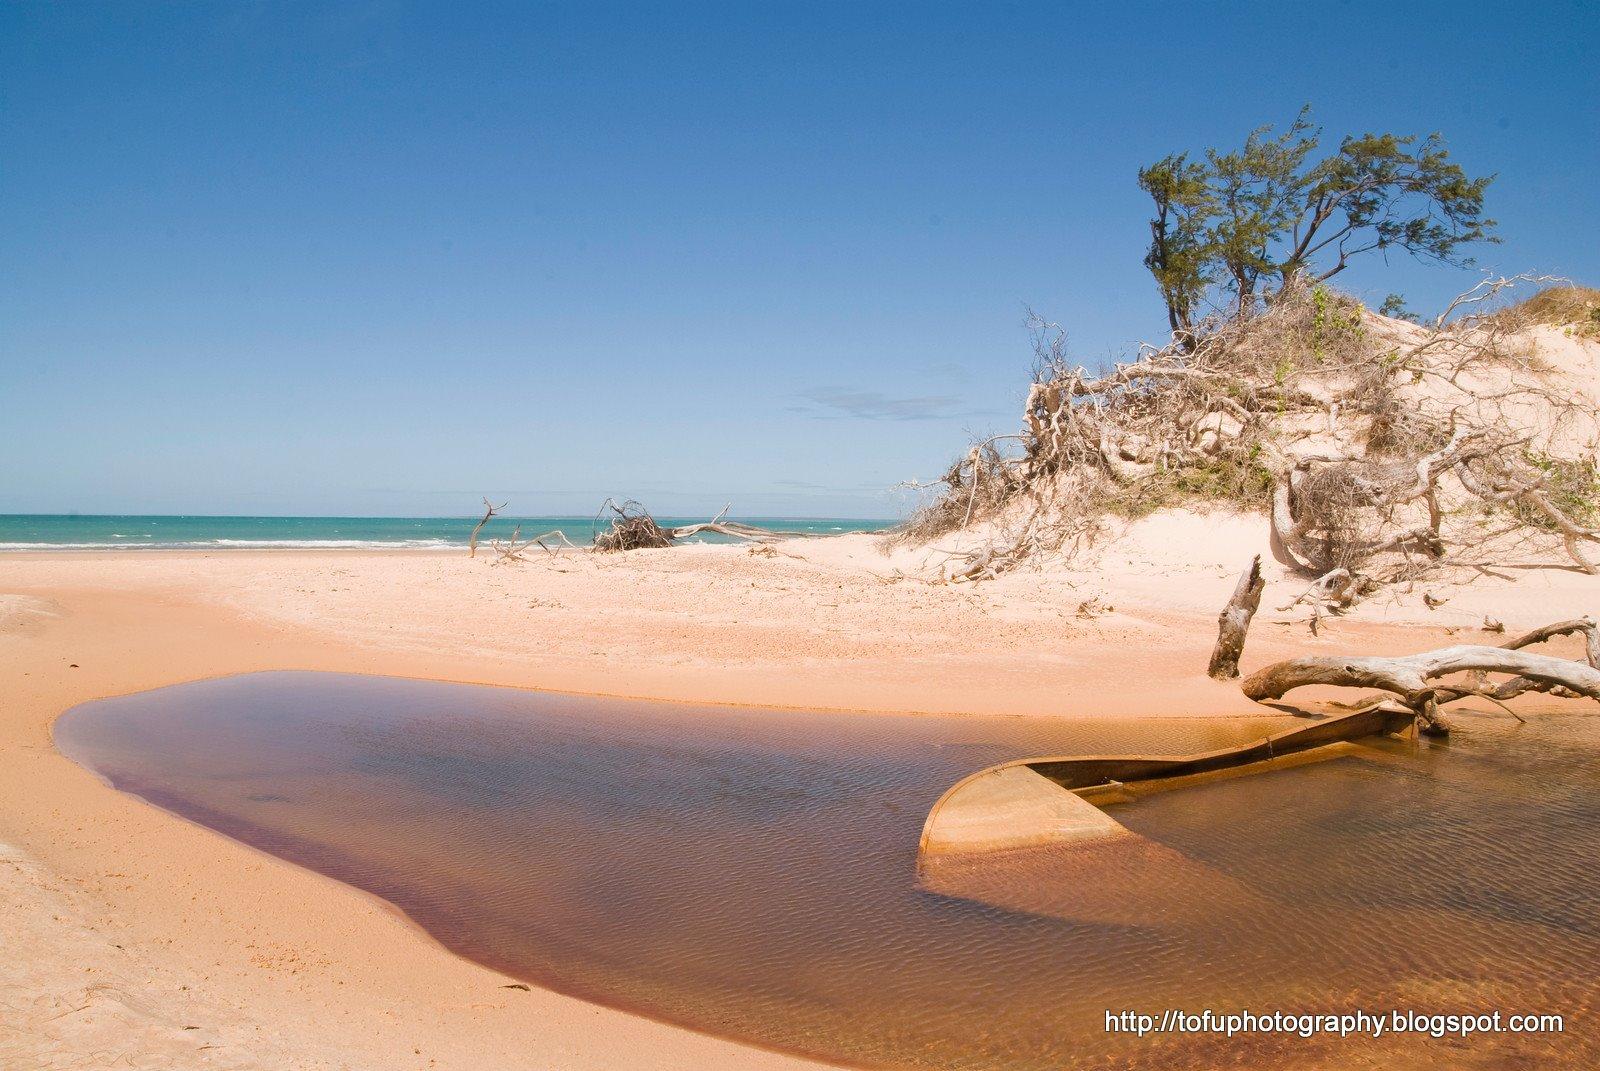 Elcho Island: Tofu Photography: Djurranalpi Beach On Elcho Island